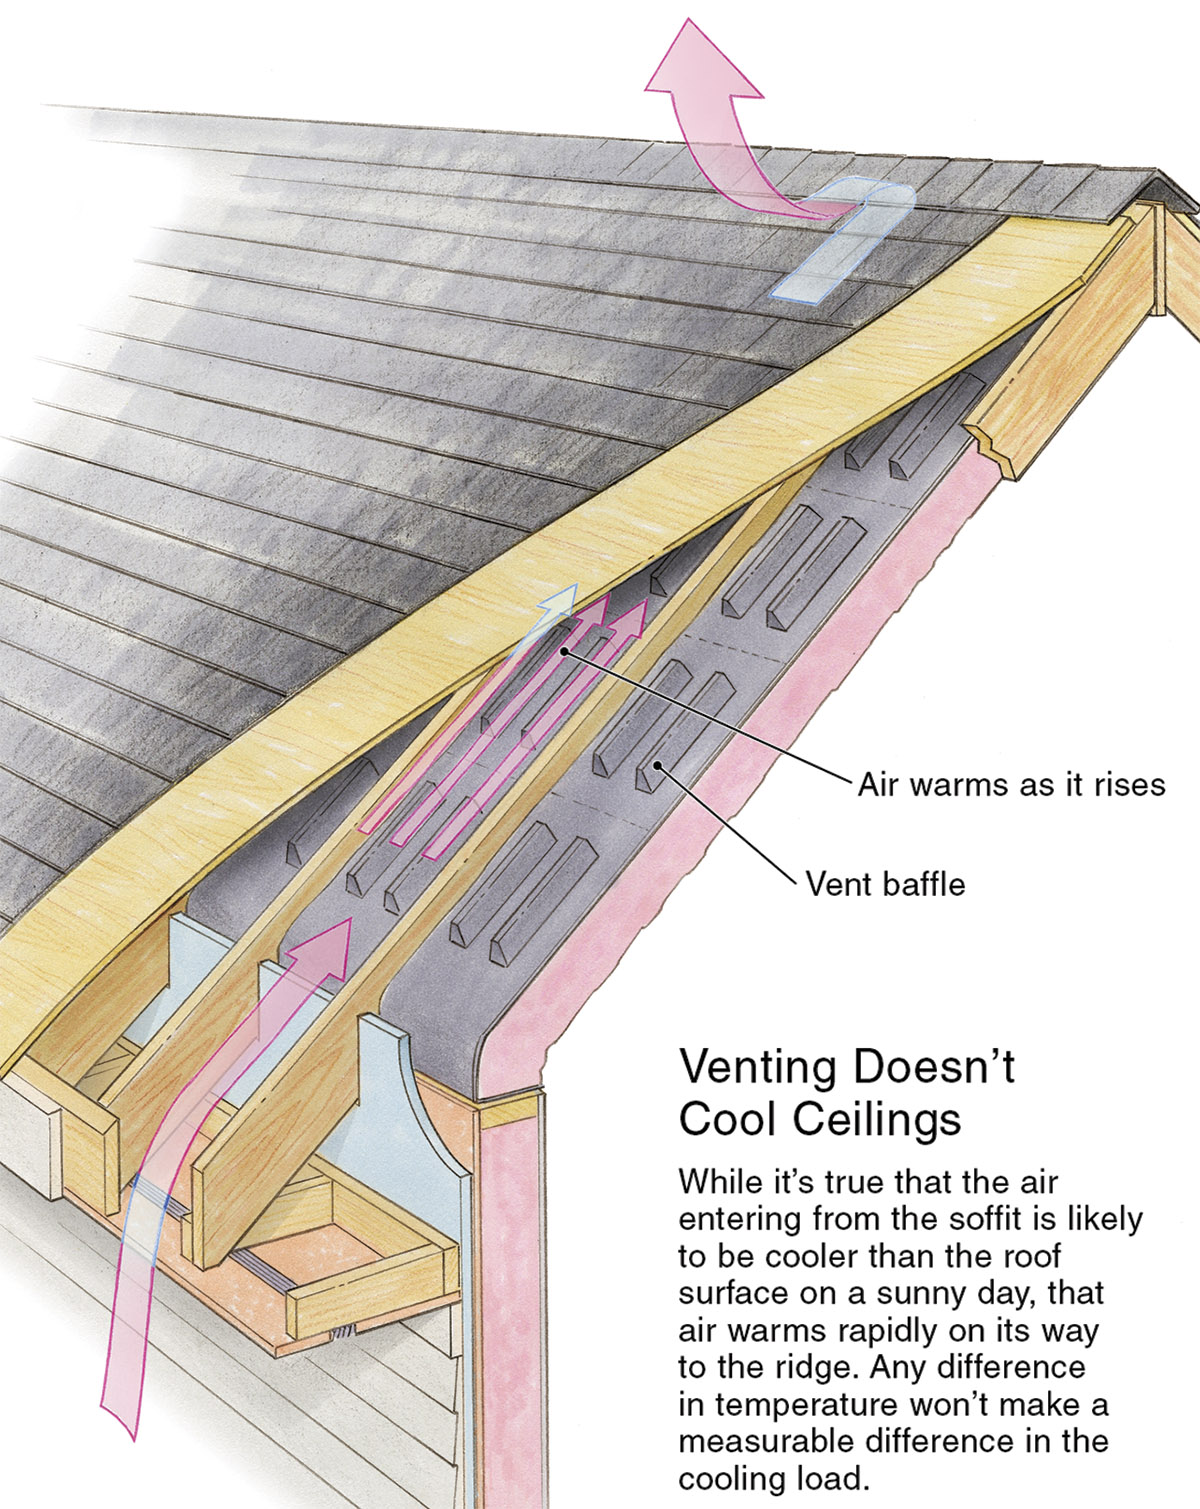 Roof Venting Doesn T Affect Cooling Loads Fine Homebuilding